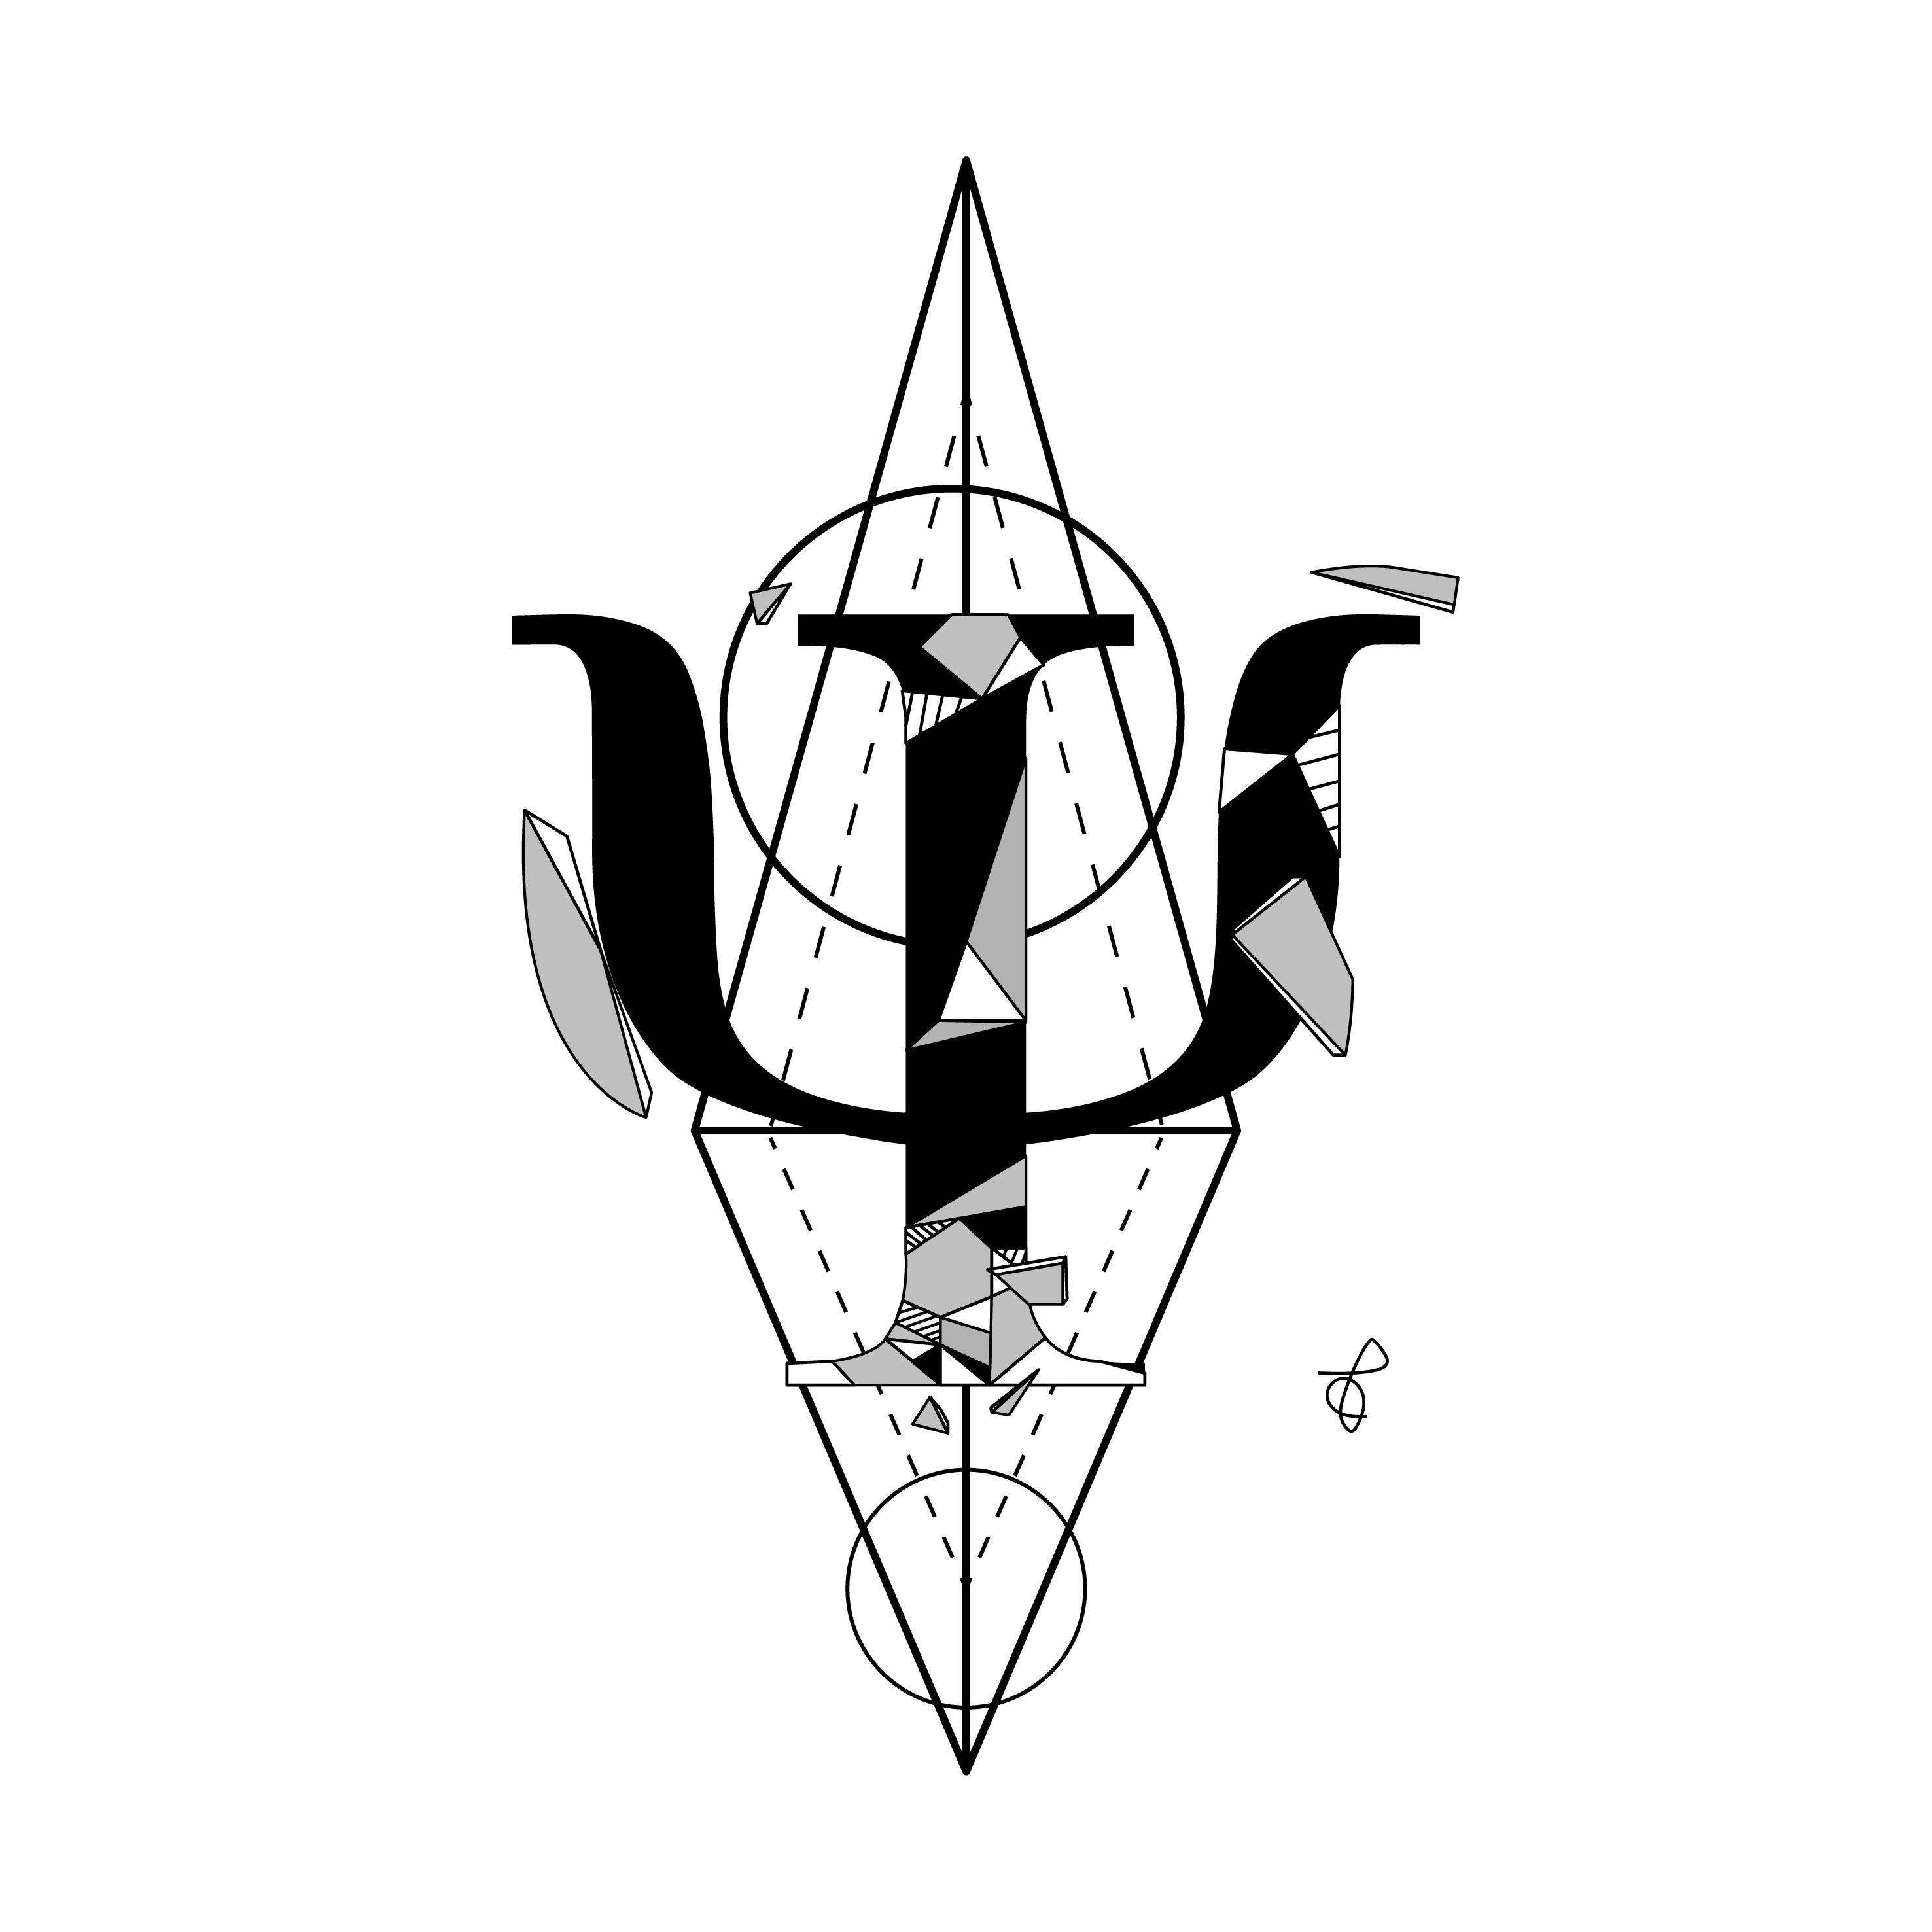 Tattoo Geometric Psychology symbol Simbolo Tatto Psicologia Geométrico  por TC Pereira